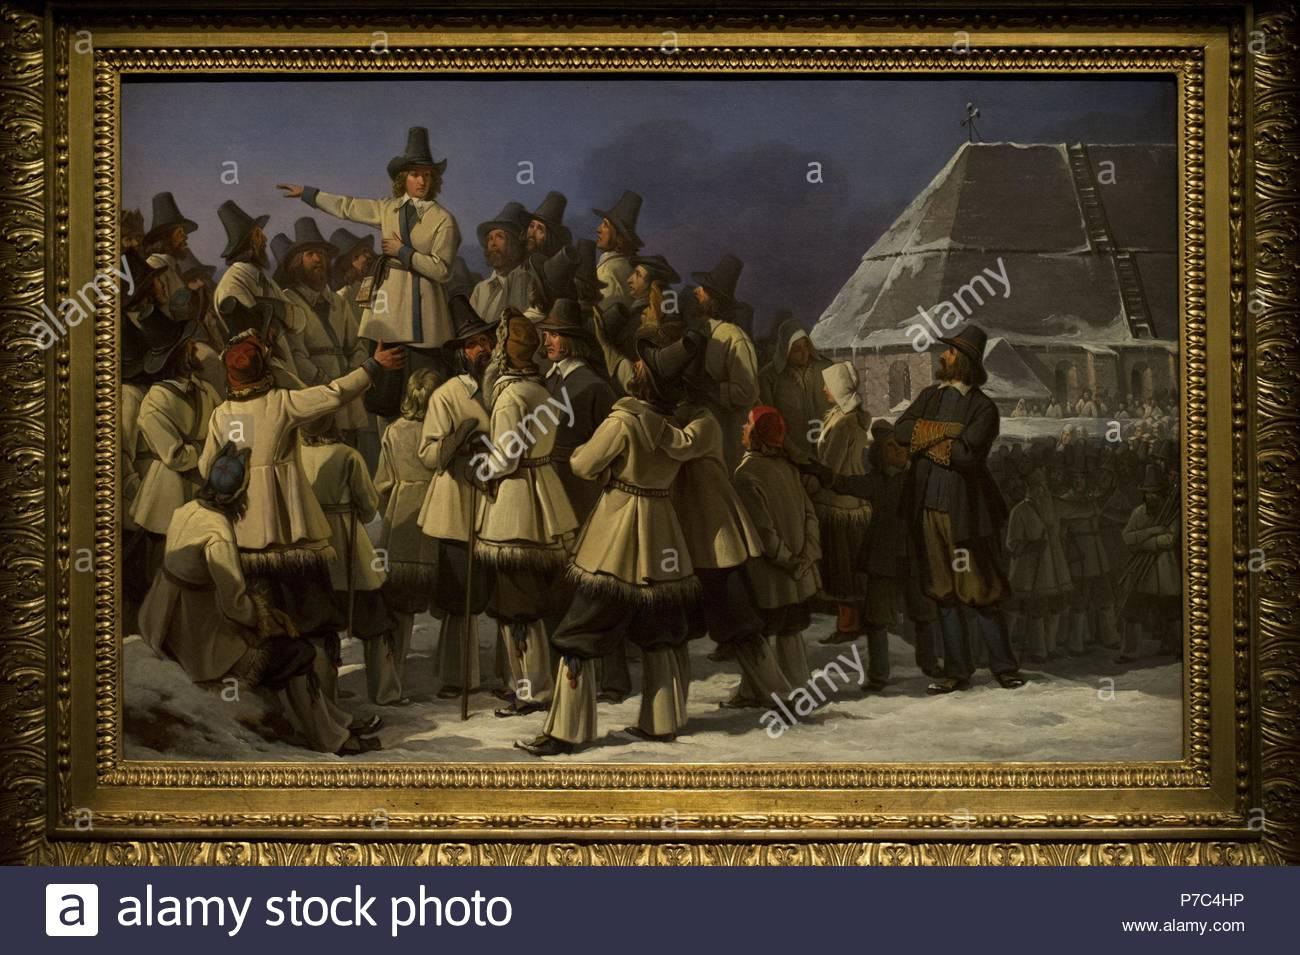 Johan Gustaf Sandberg (1782-1854). Swedish painter. King Gustav Vasa (1496-1560) in Mora, 1836. National Museum. Stockholm. Swedish. - Stock Image